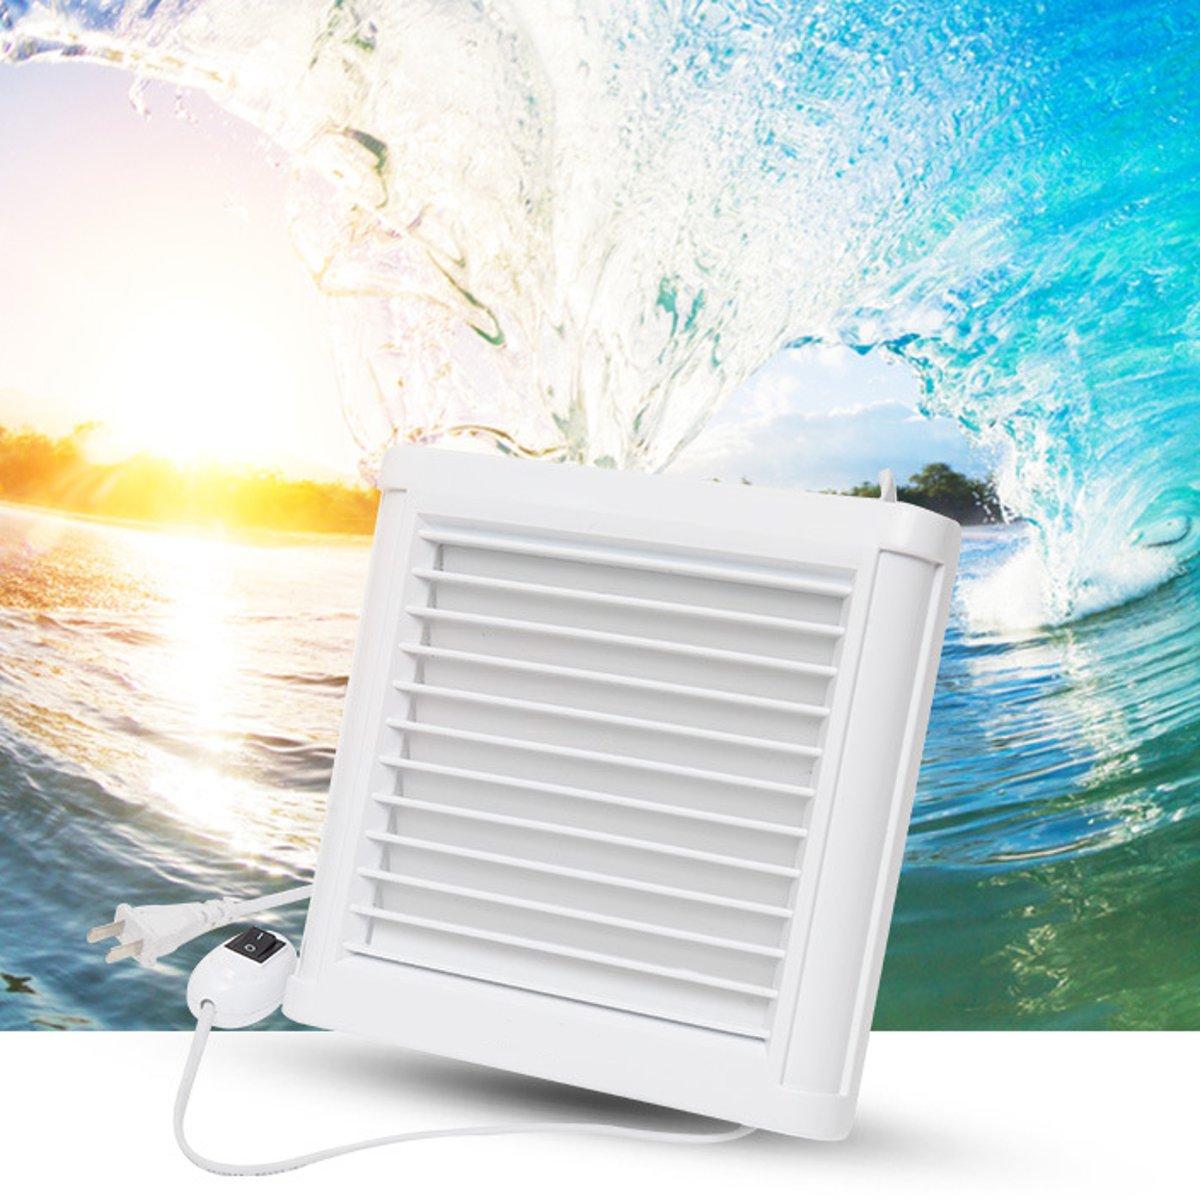 Waterproof Mute Bathroom Extractor Exhaust Fan Ventilating Strong Fan For Kitchen Toilet Window Ventilation Fans 4Inch 6 Inch